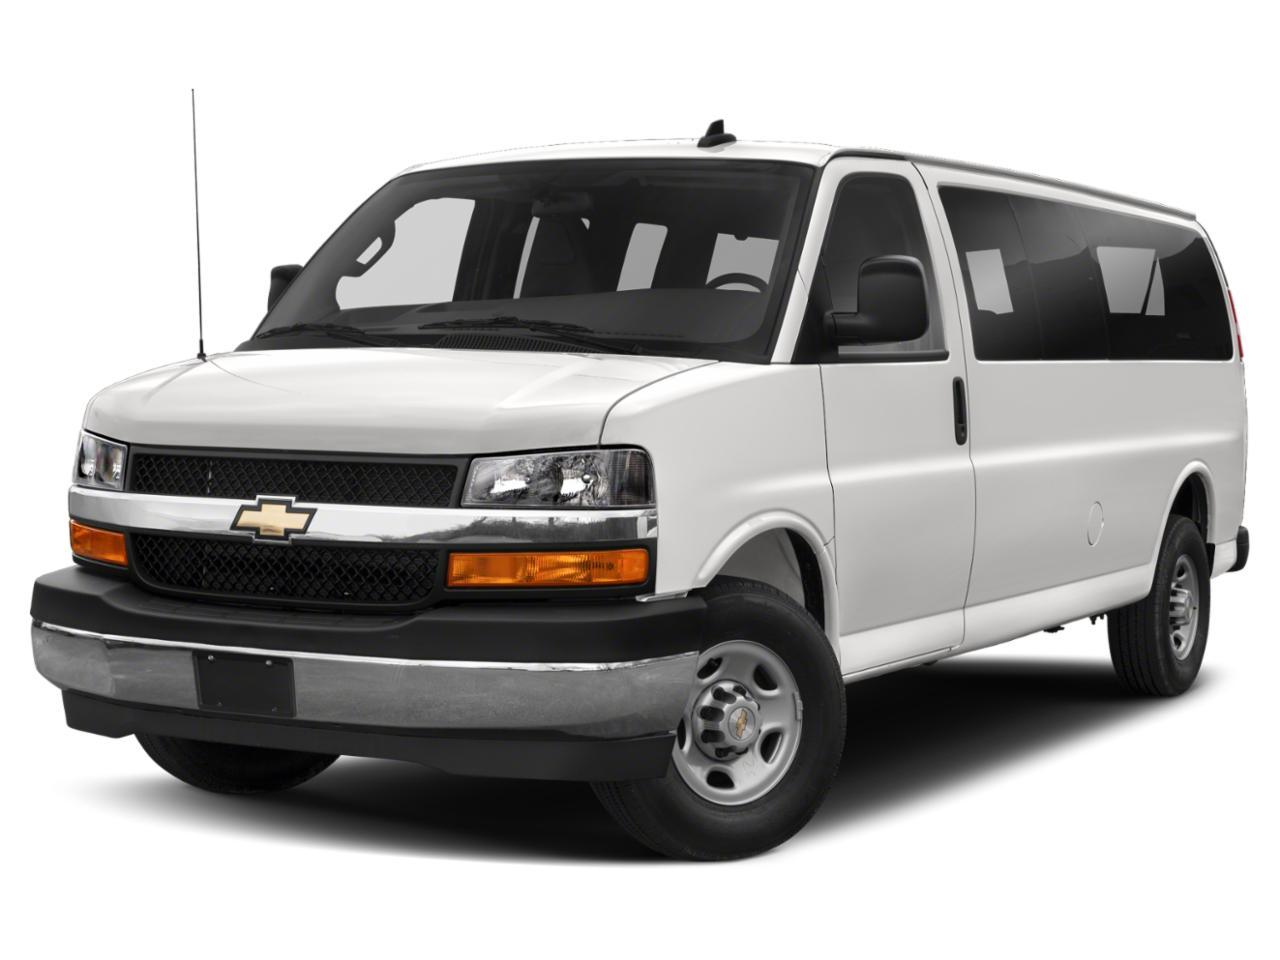 2020 Chevrolet Express Passenger Vehicle Photo in Redding, CA 96002